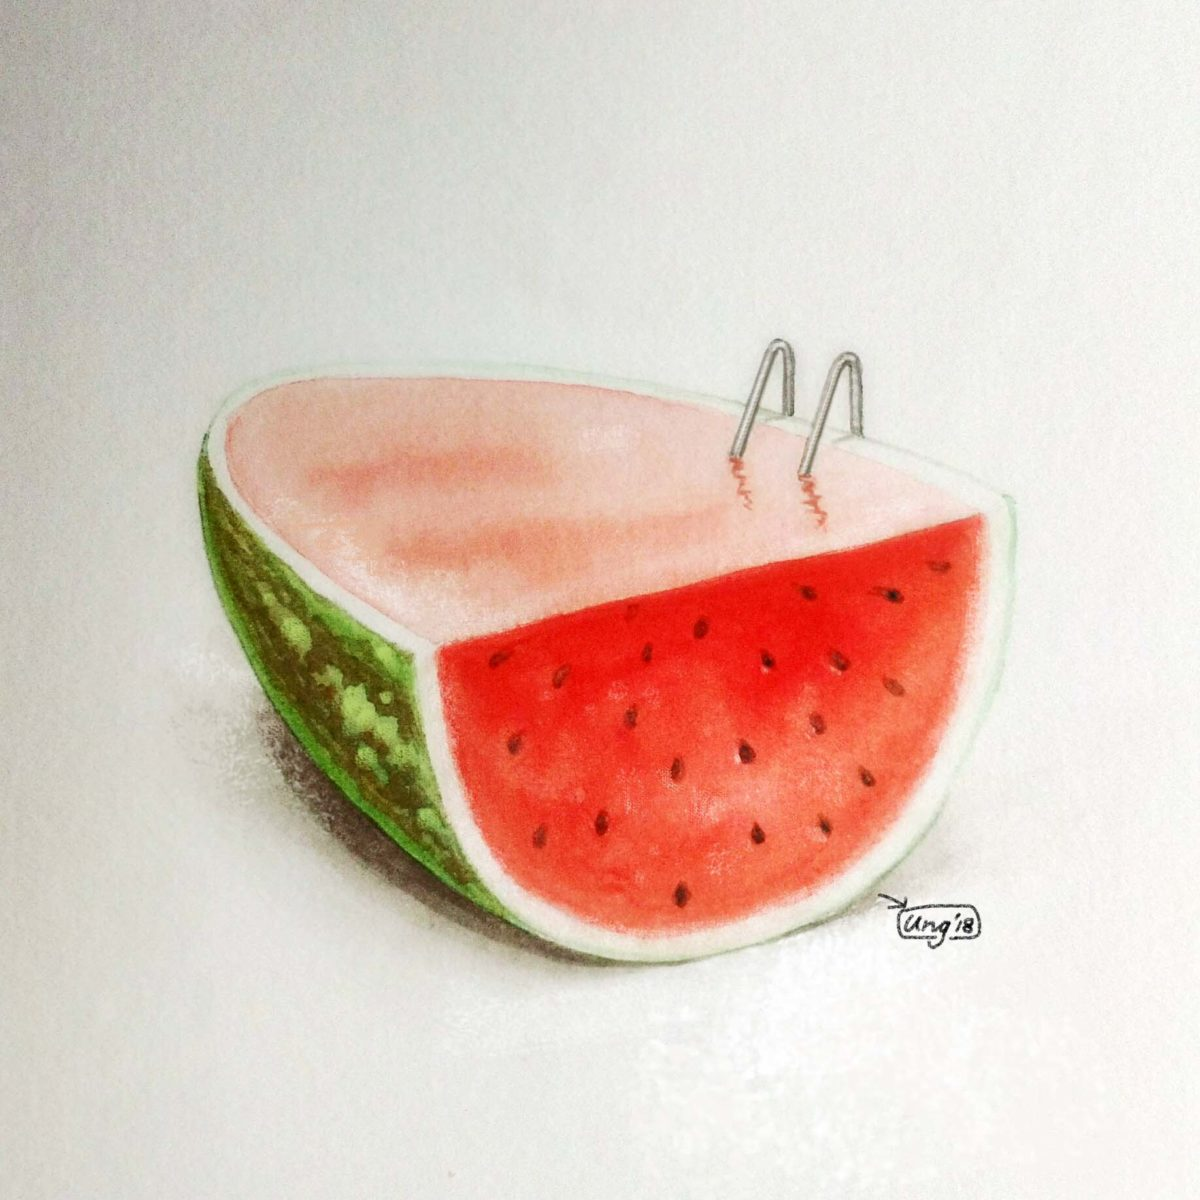 Ideation: Mengupas (imaji) Semangka